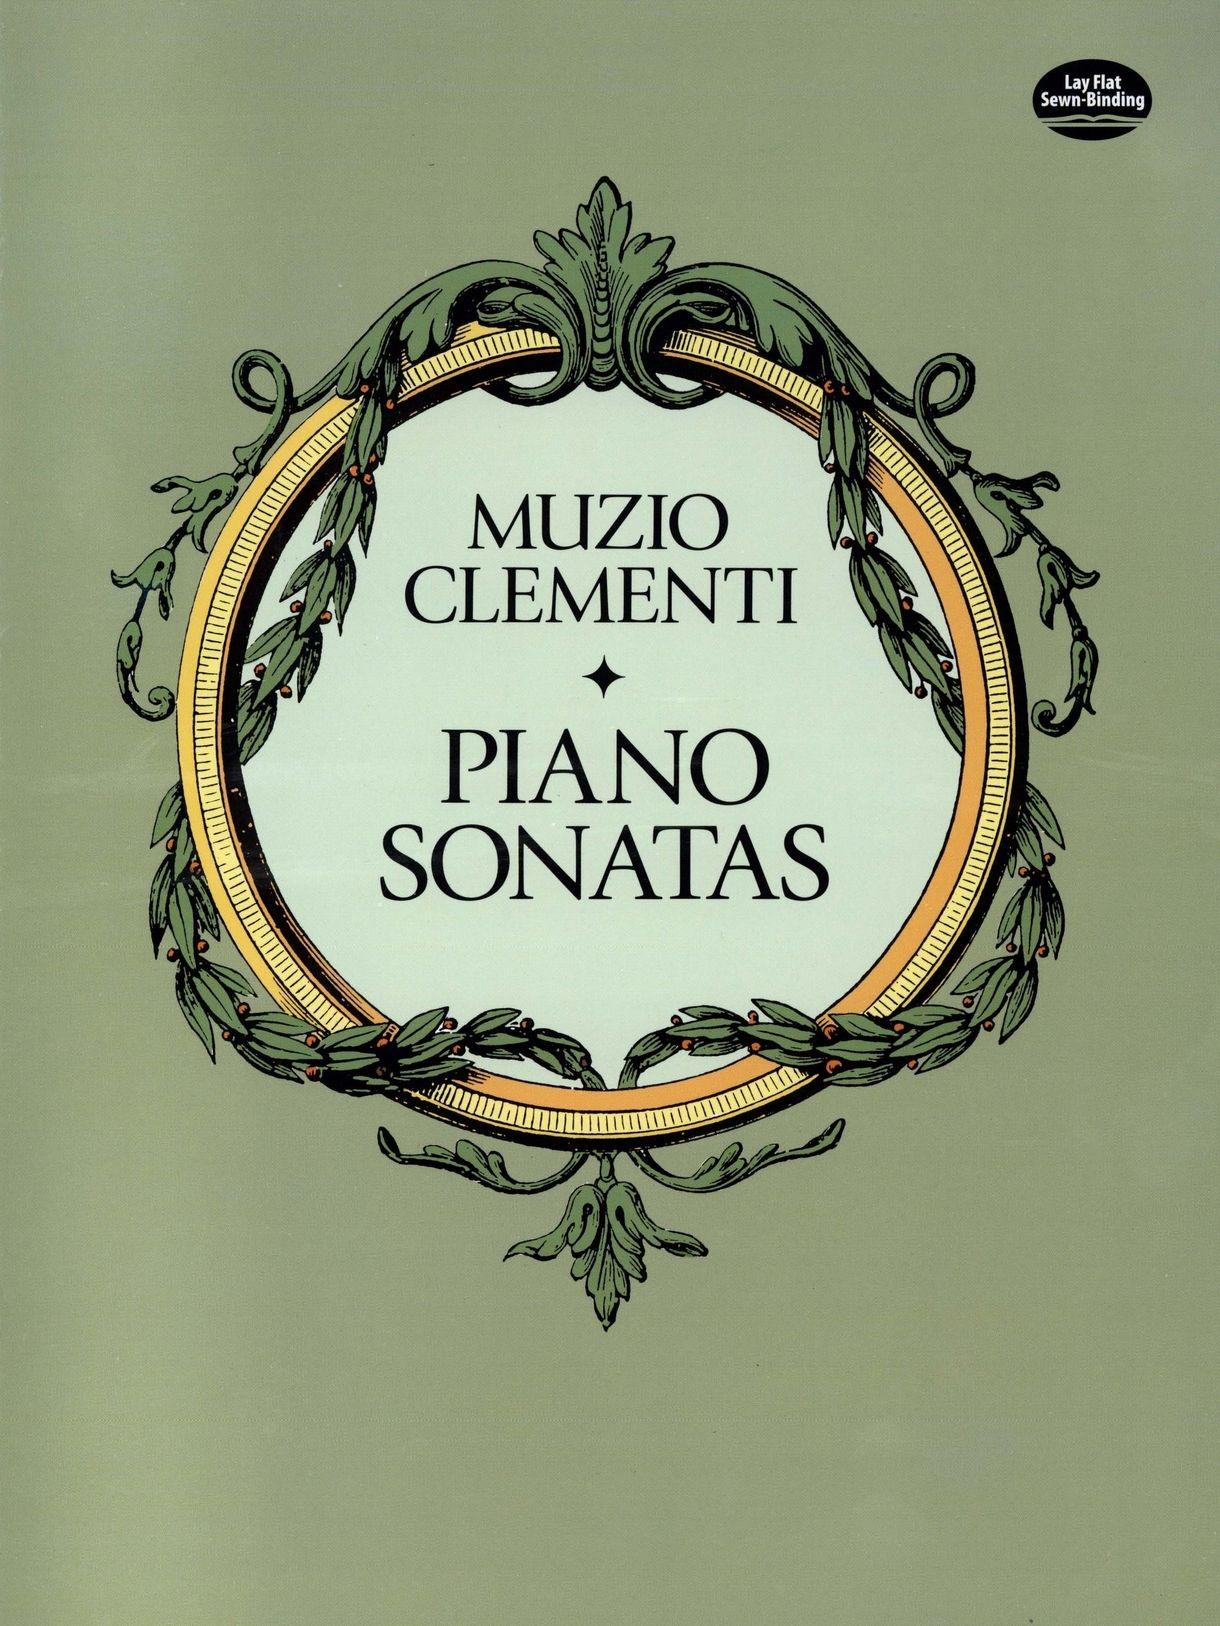 Piano Sonatas by Muzio Clementi Treasury of keyboard music by extremely…